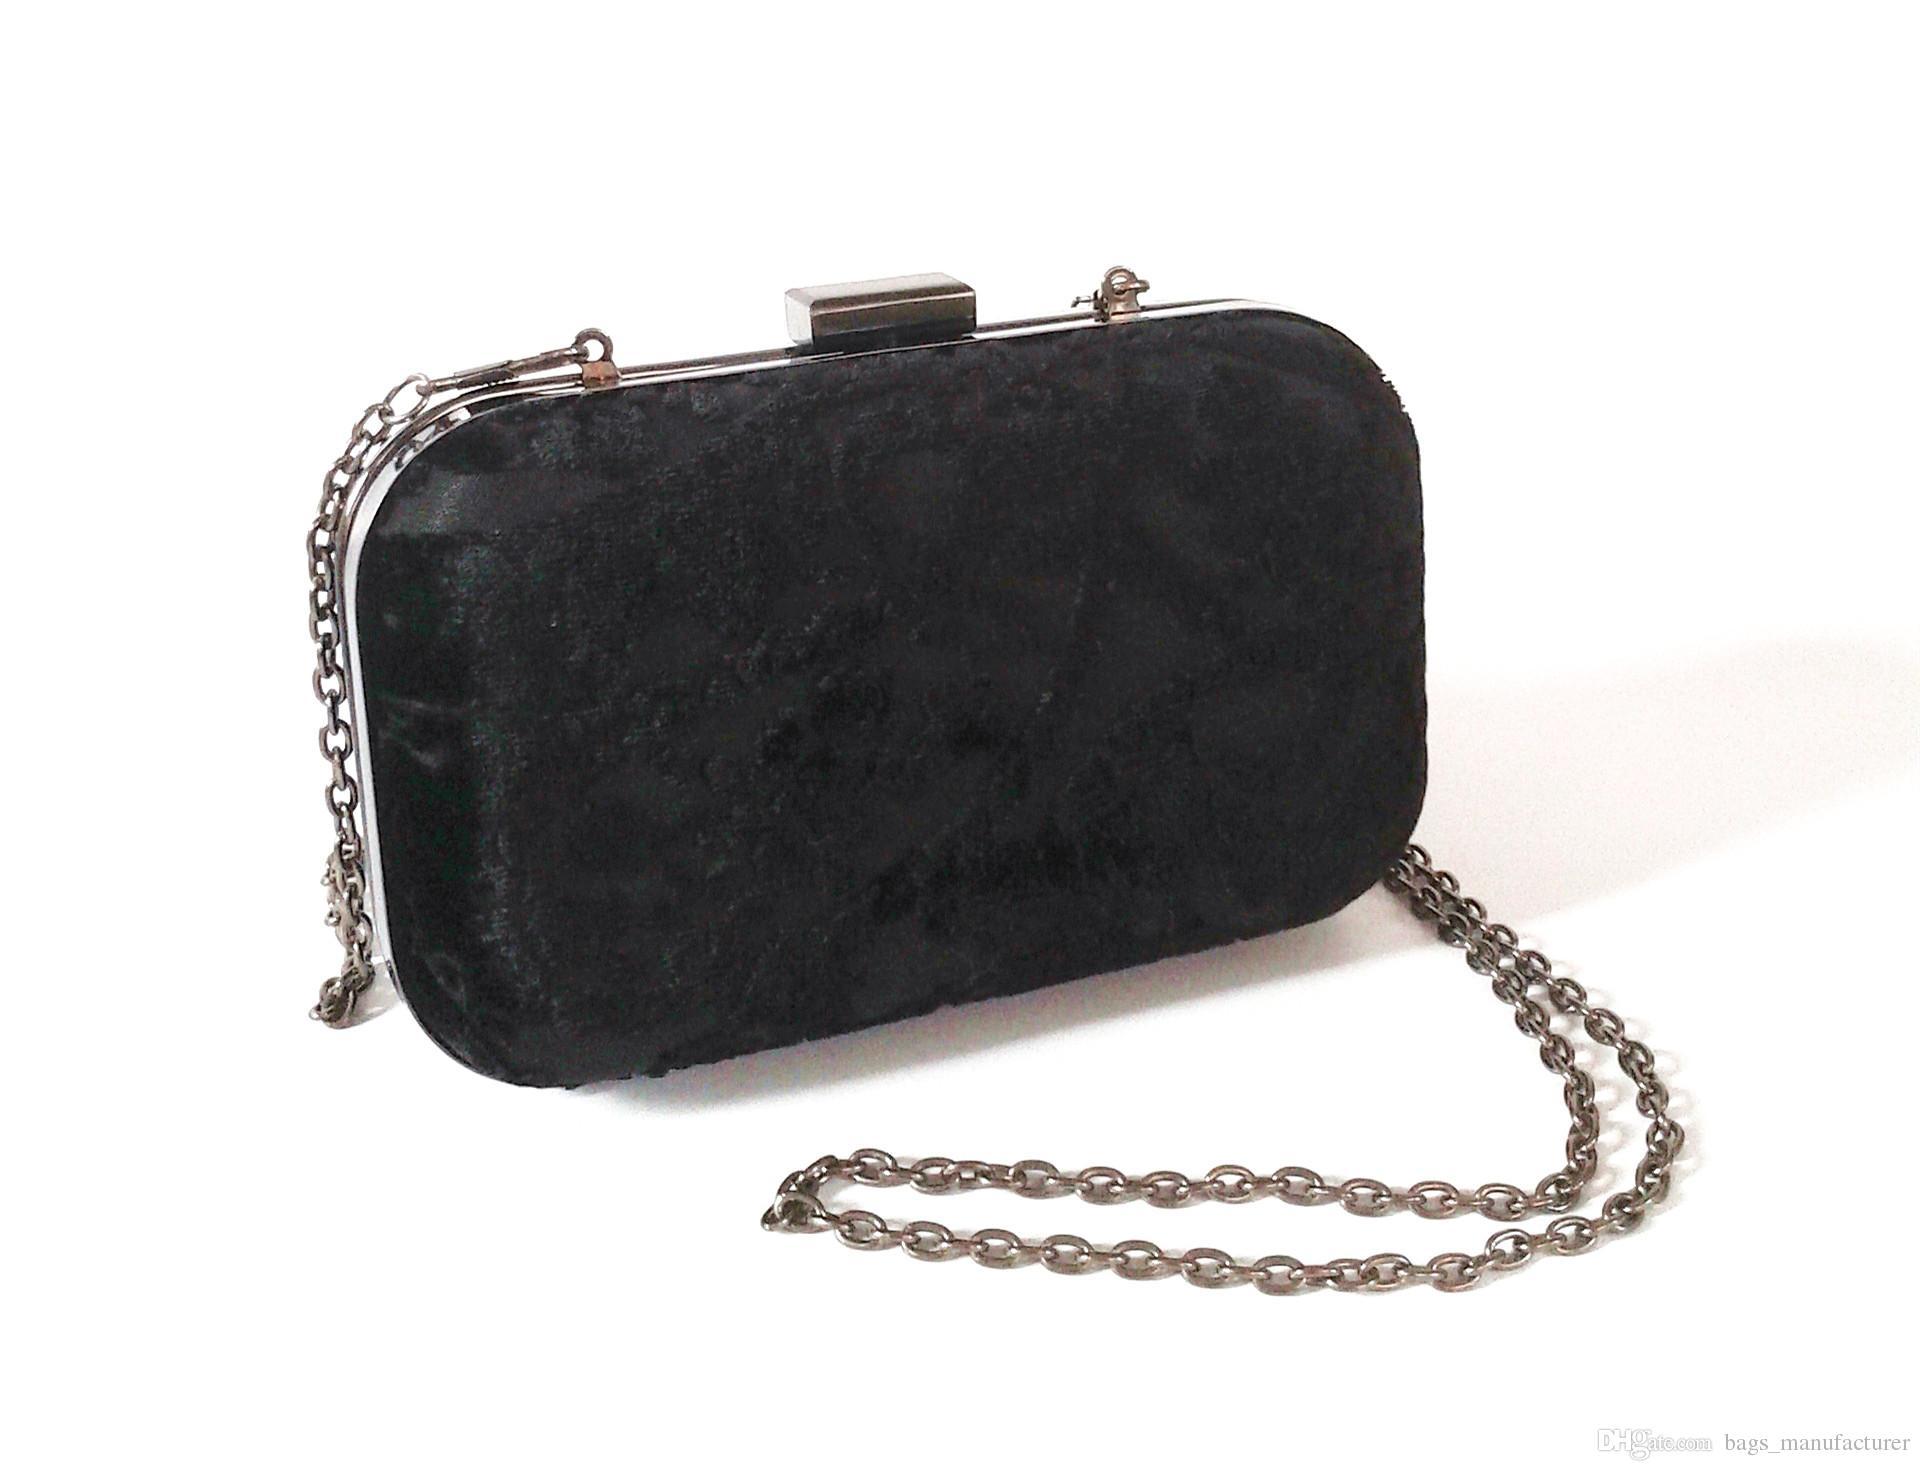 BLACK VELVET Clutch Bag NEW Formal Evening Handbag with Chain Strap